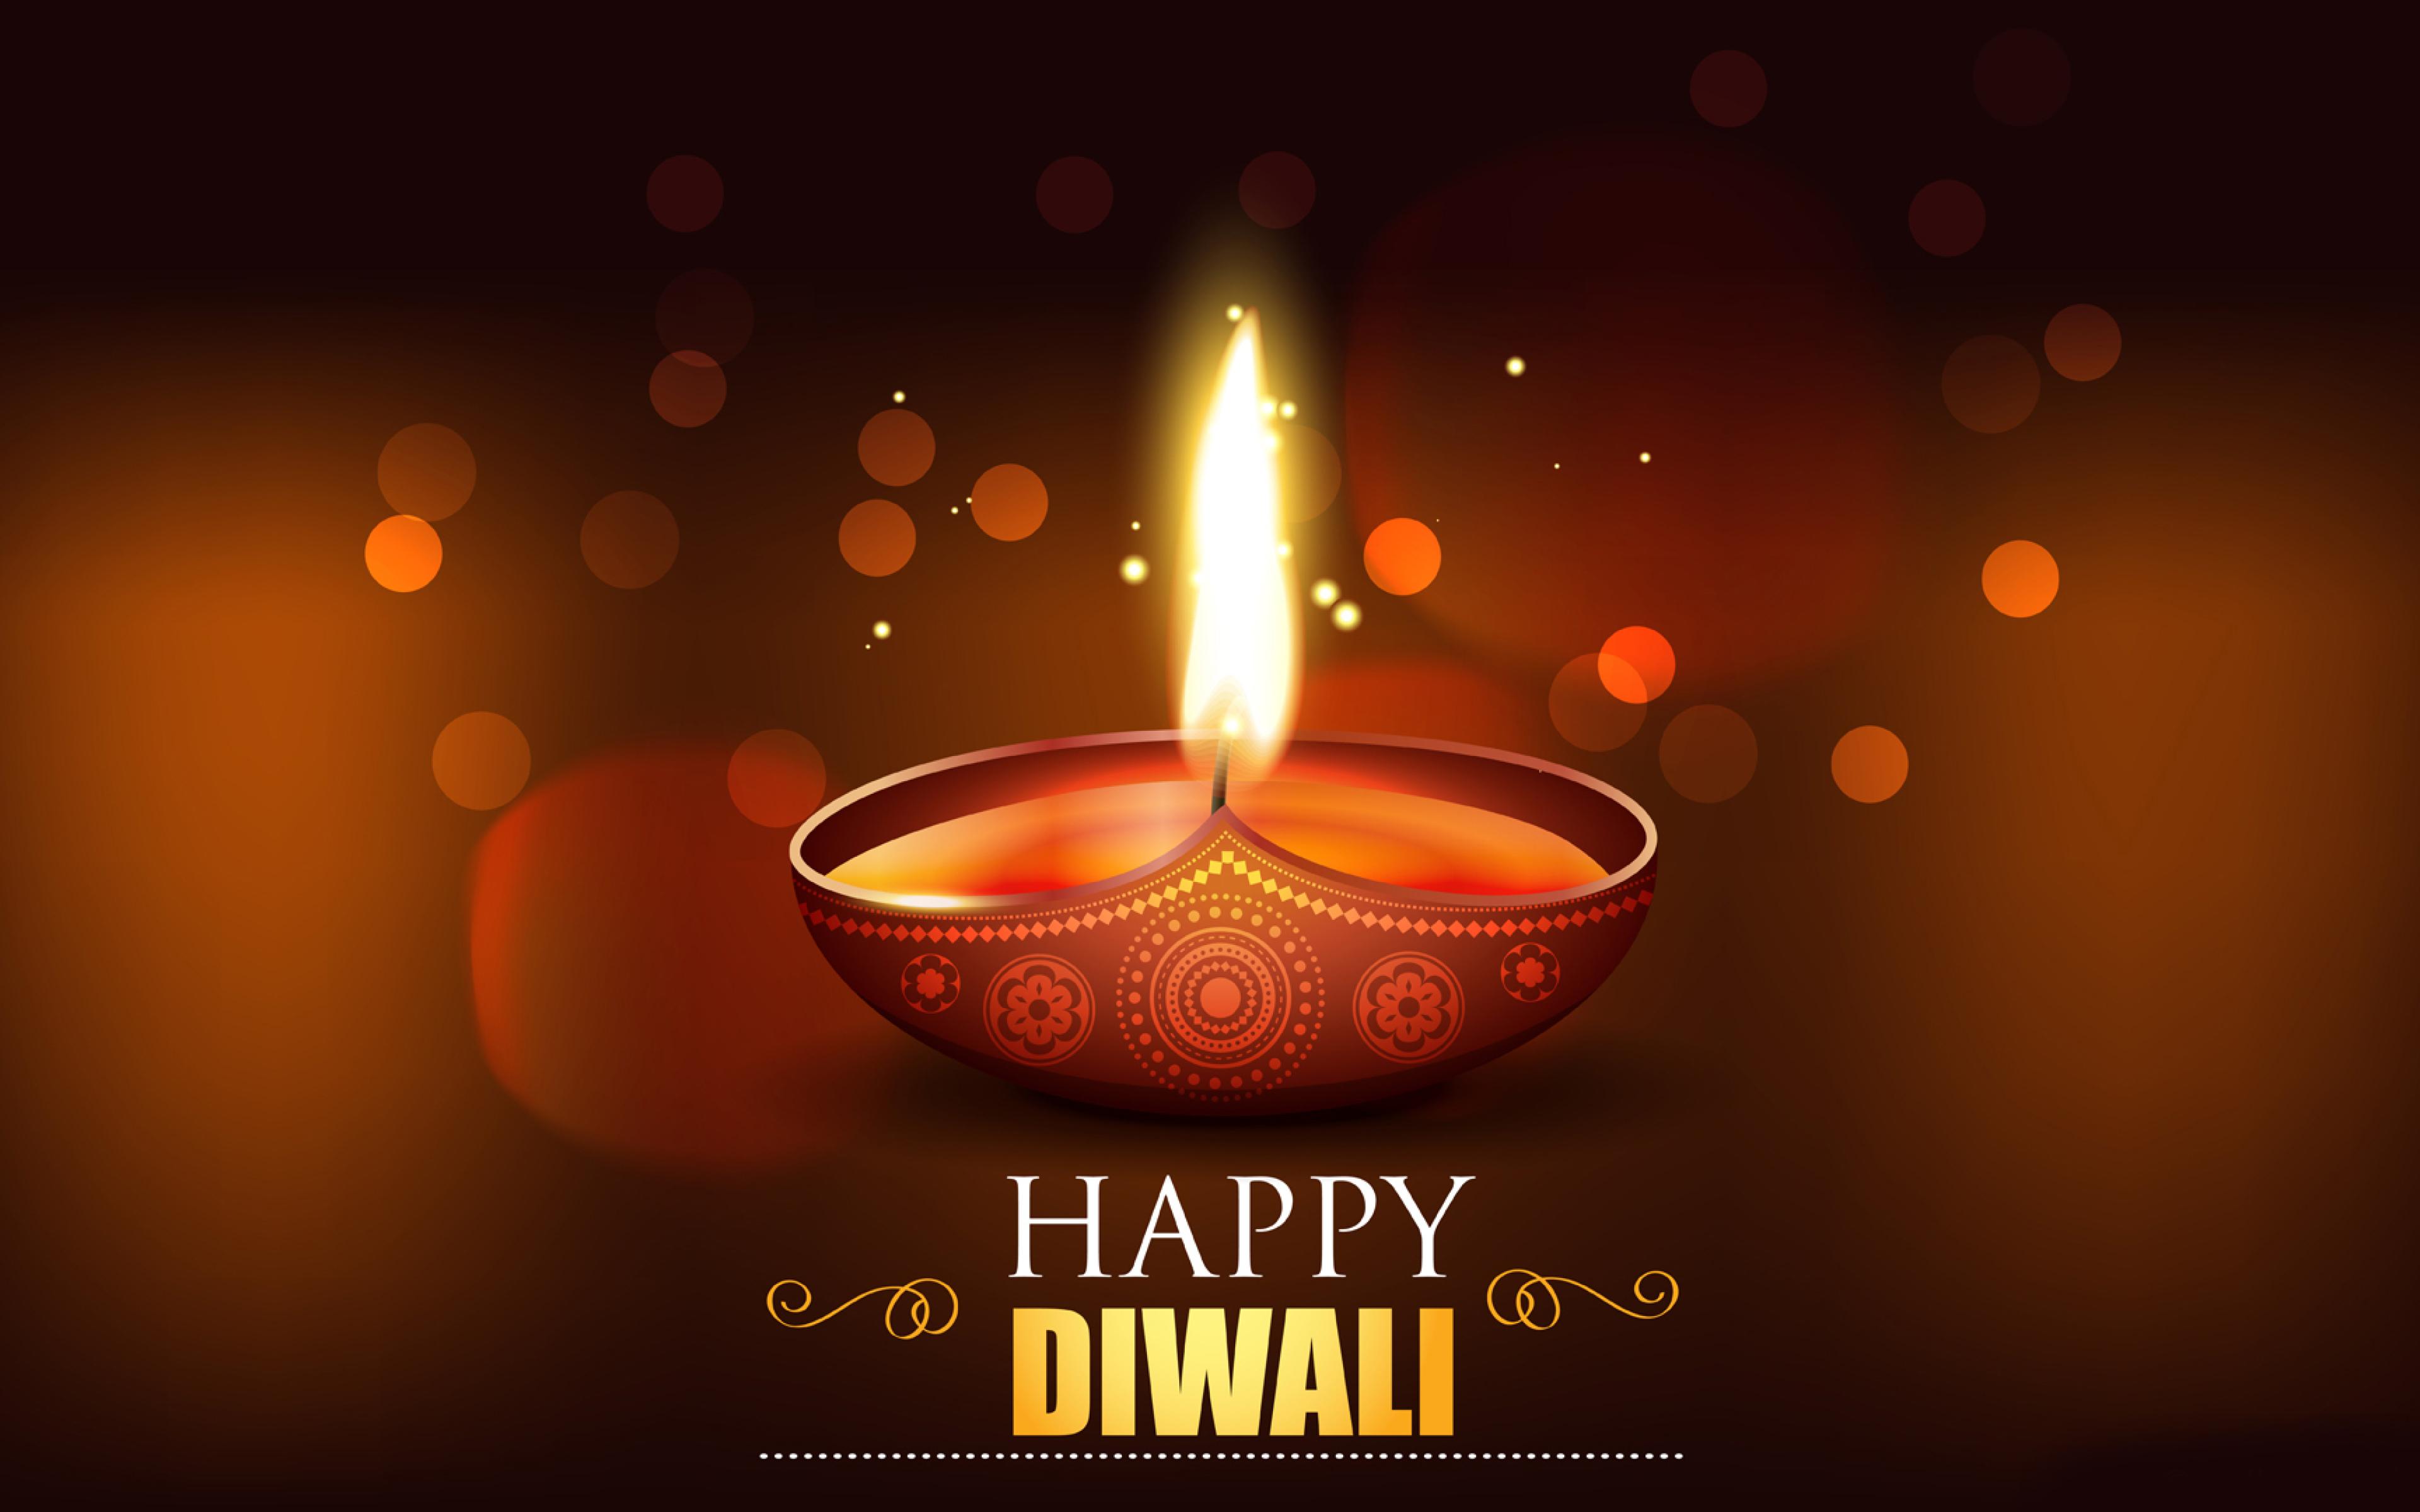 Happy Diwali 2020 Wallpaper in 3840x2400 Resolution